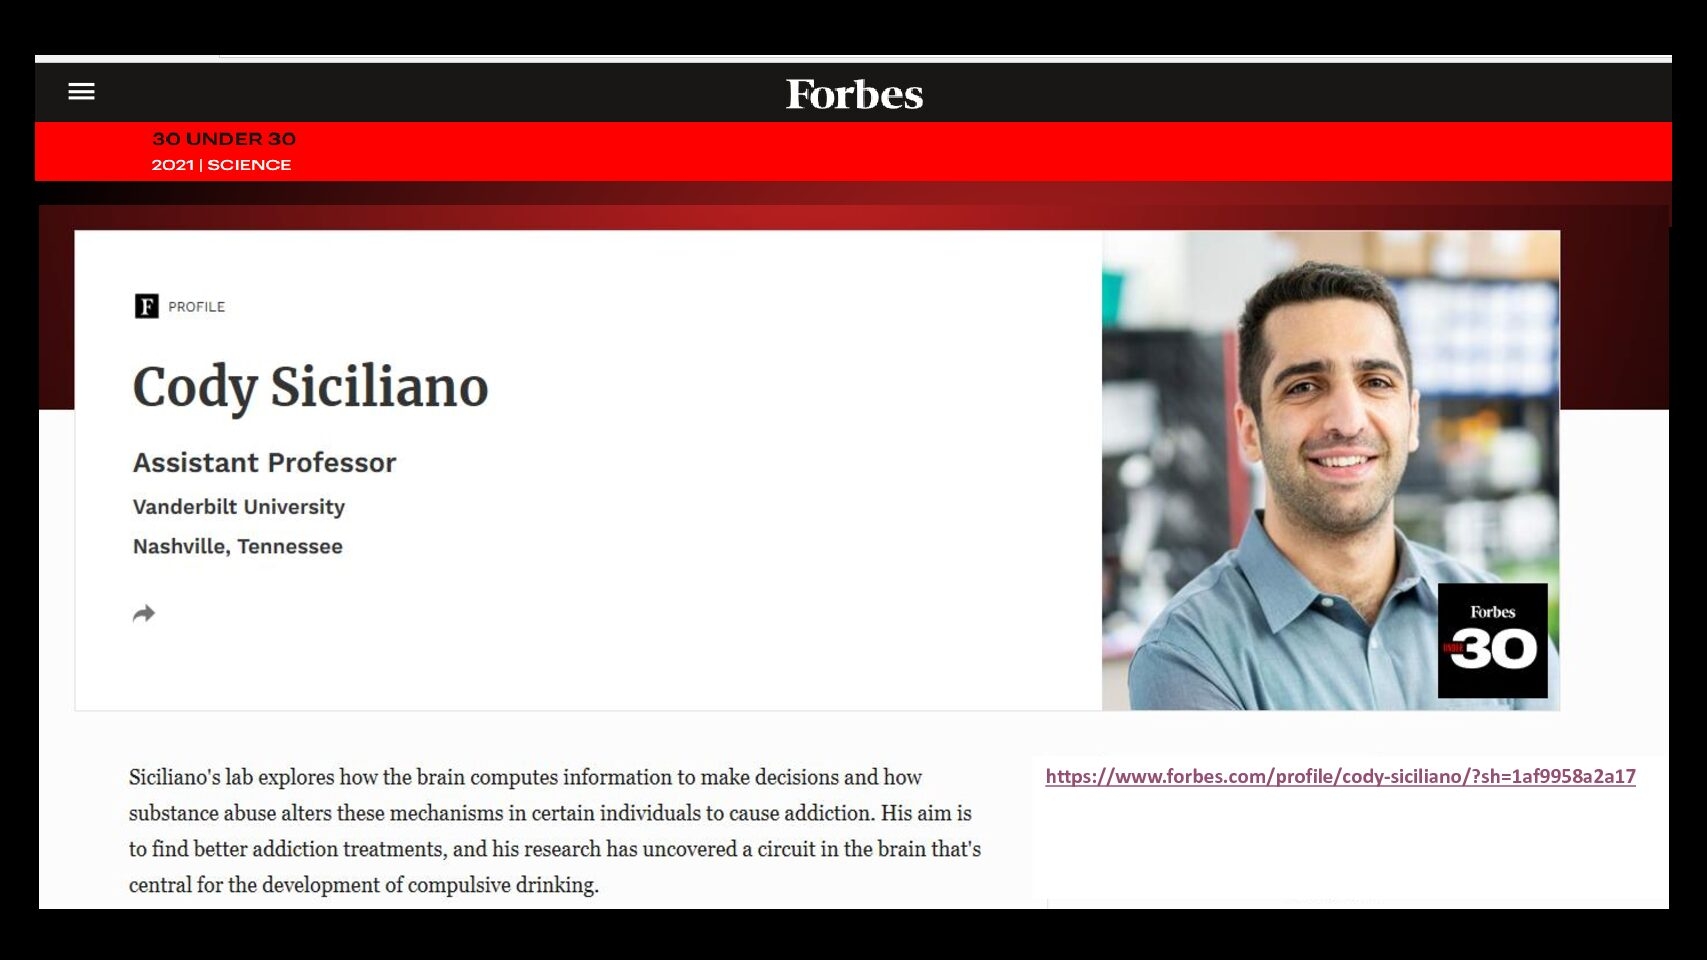 Forbes 30 UNDER 30 2021 Cody Siciliano